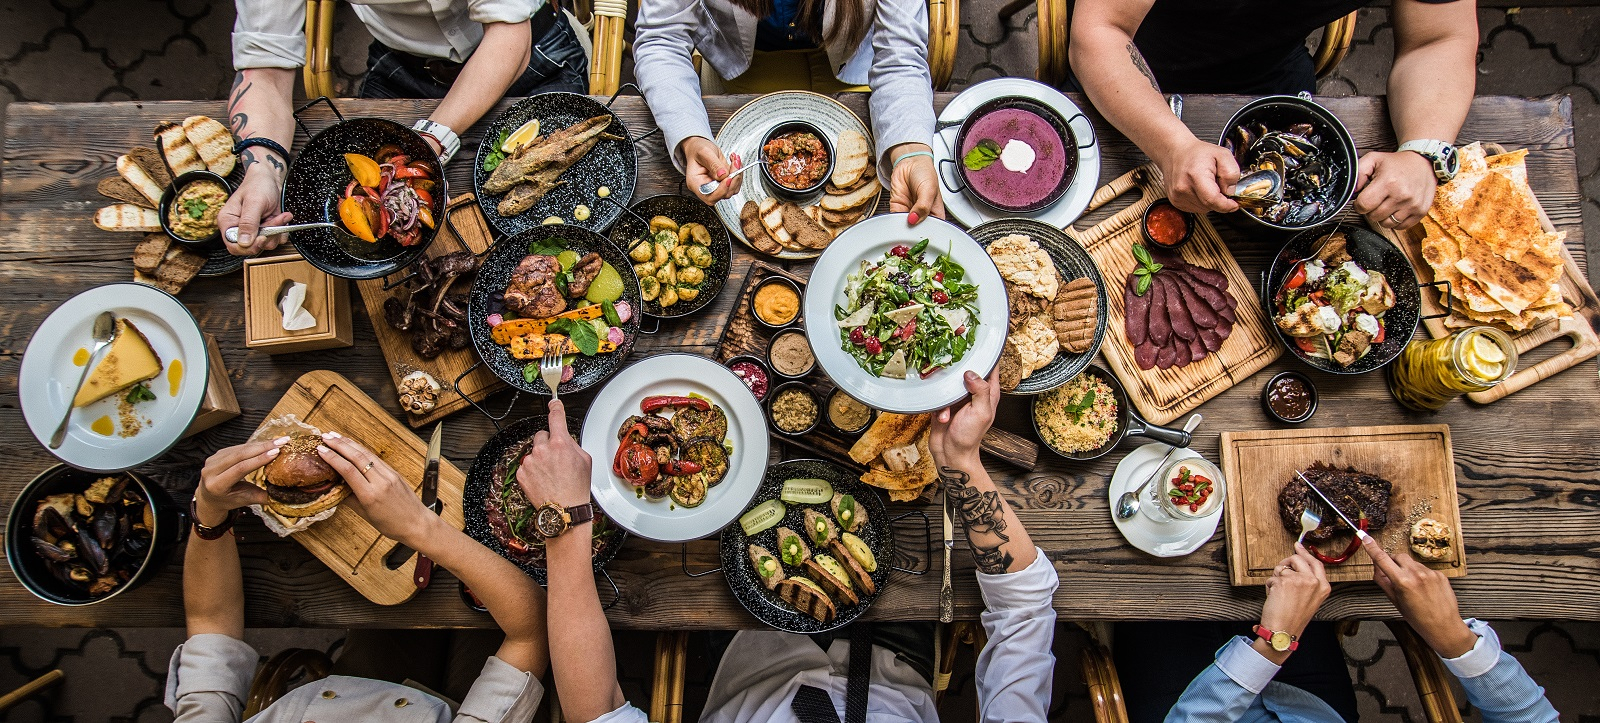 International Food Days - Unique Destination